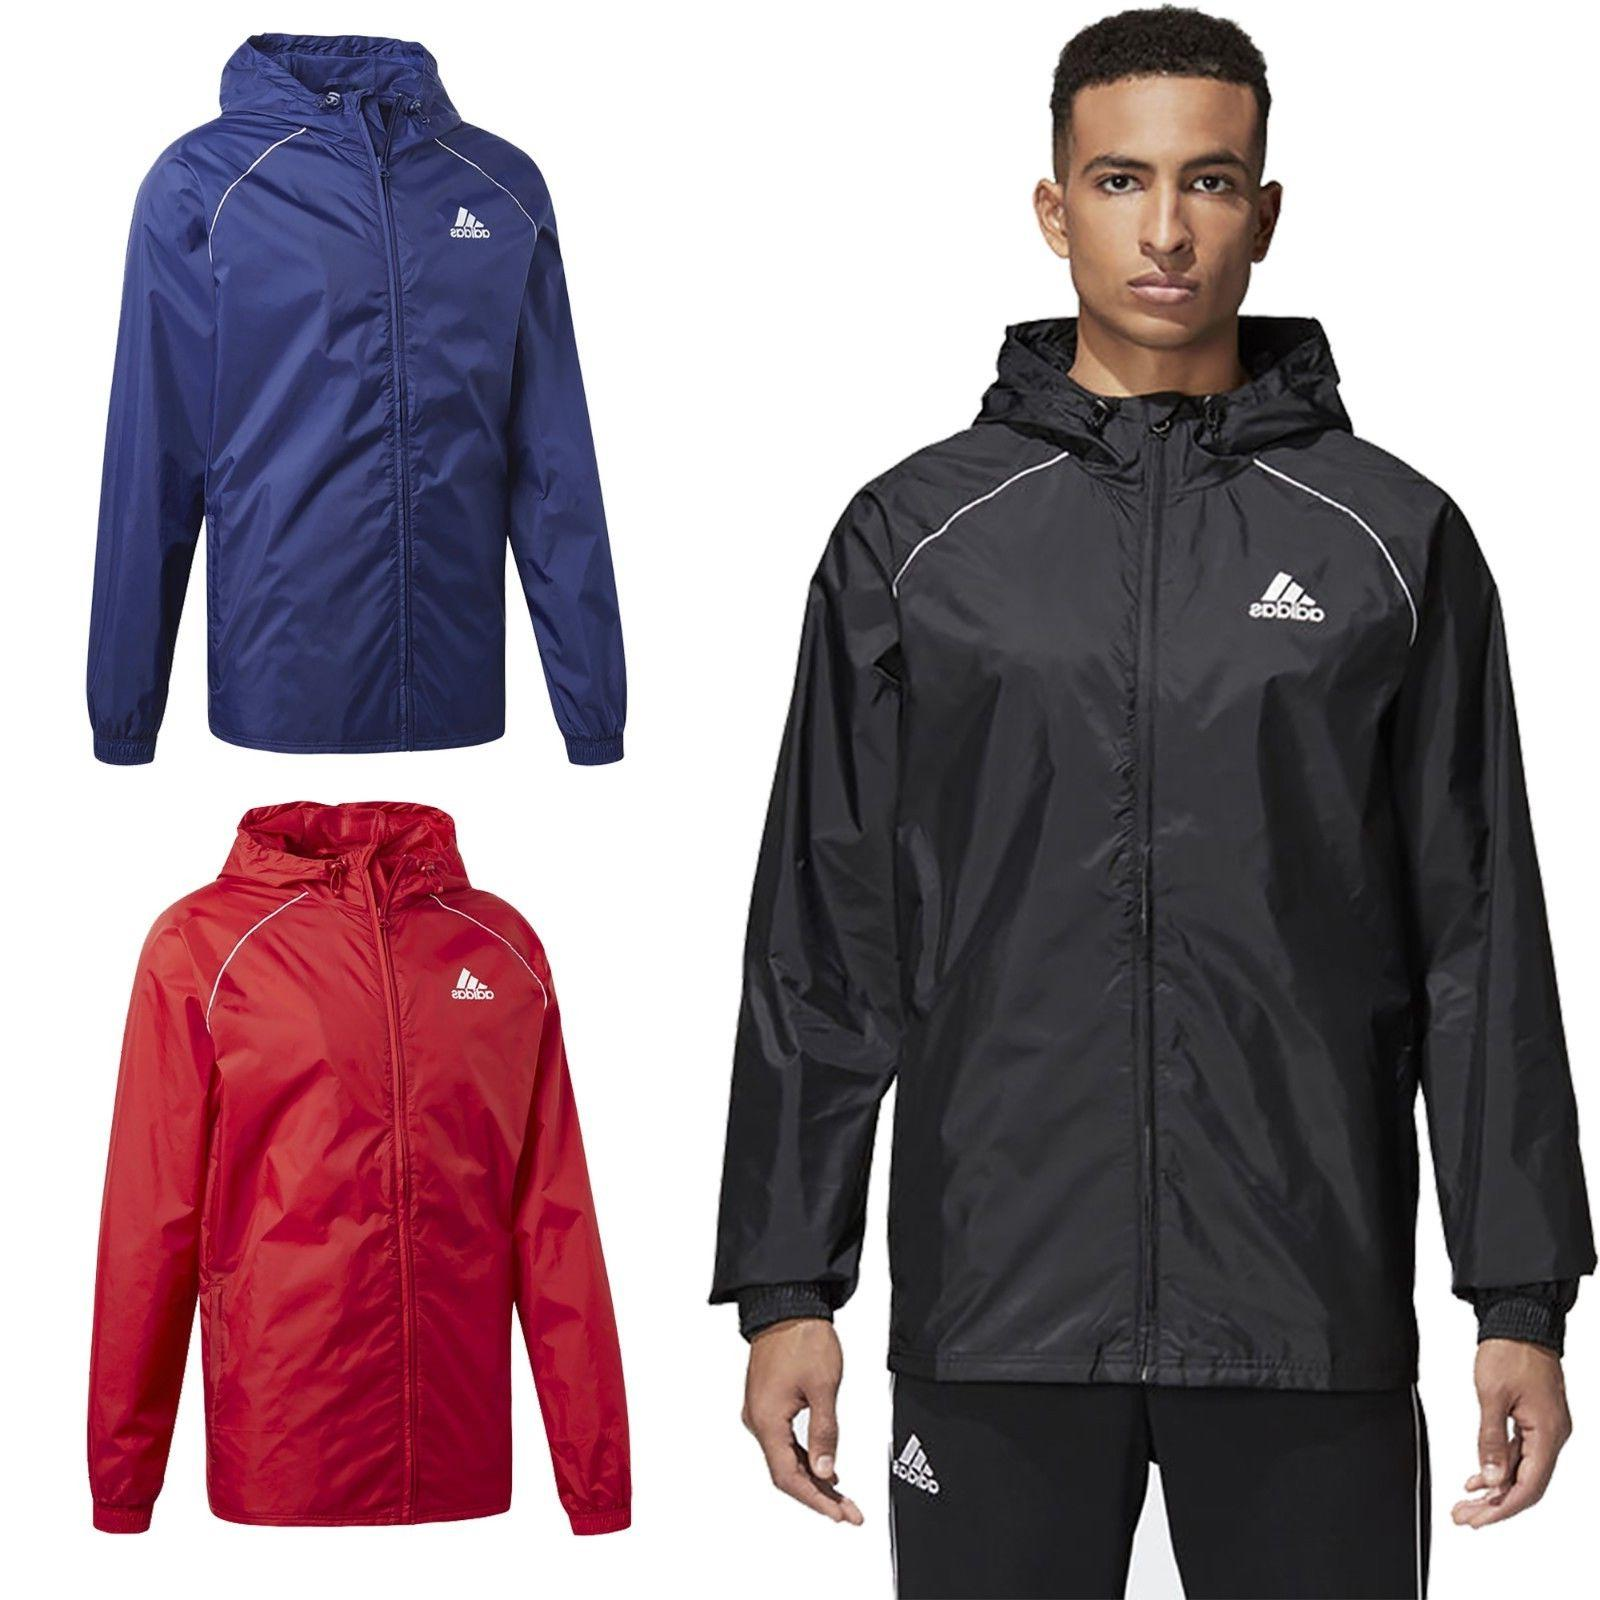 Adidas Mens Lightweight Rain Jacket Waterproof Coat Top